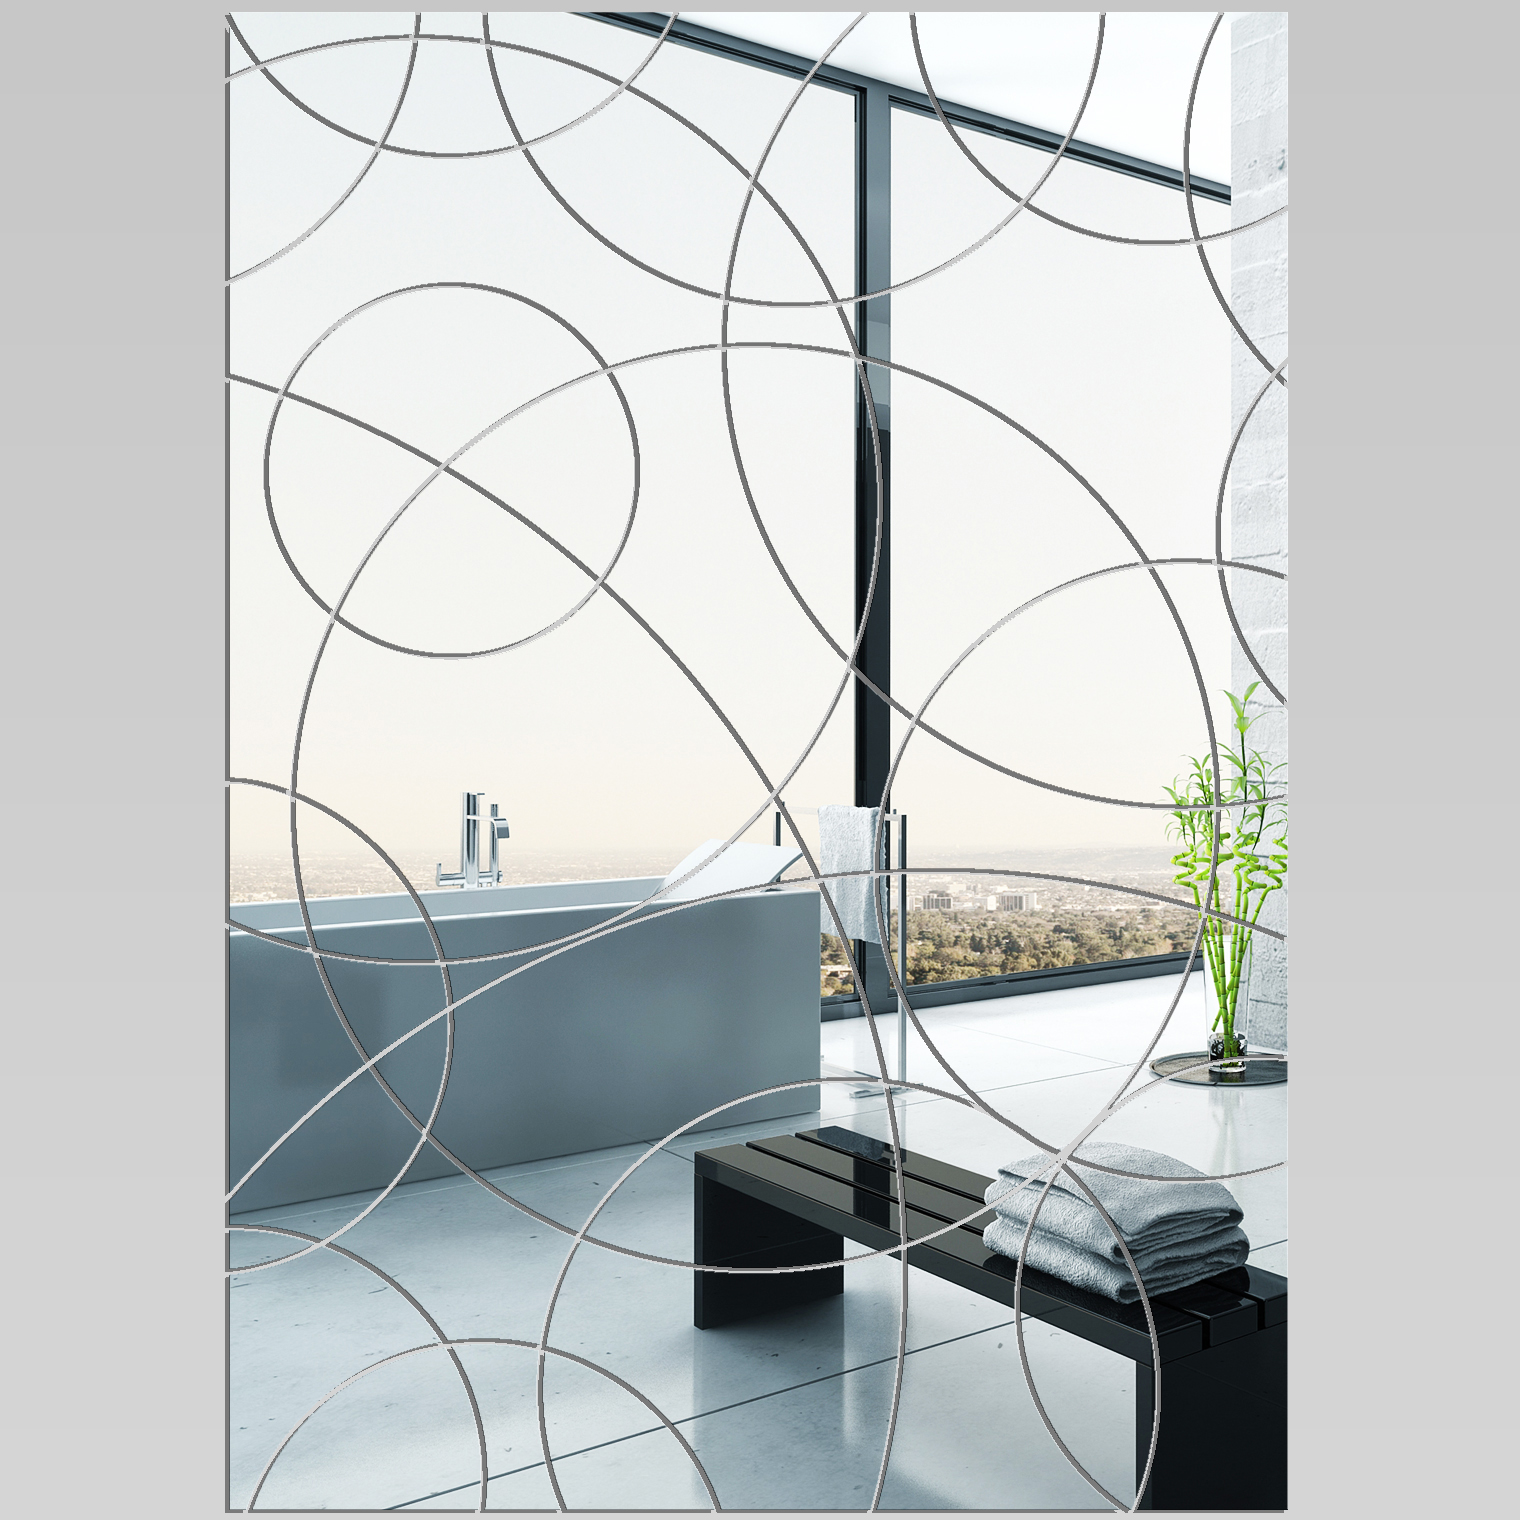 Miroir plexiglass acrylique rectangle design pas cher for Miroir acrylique